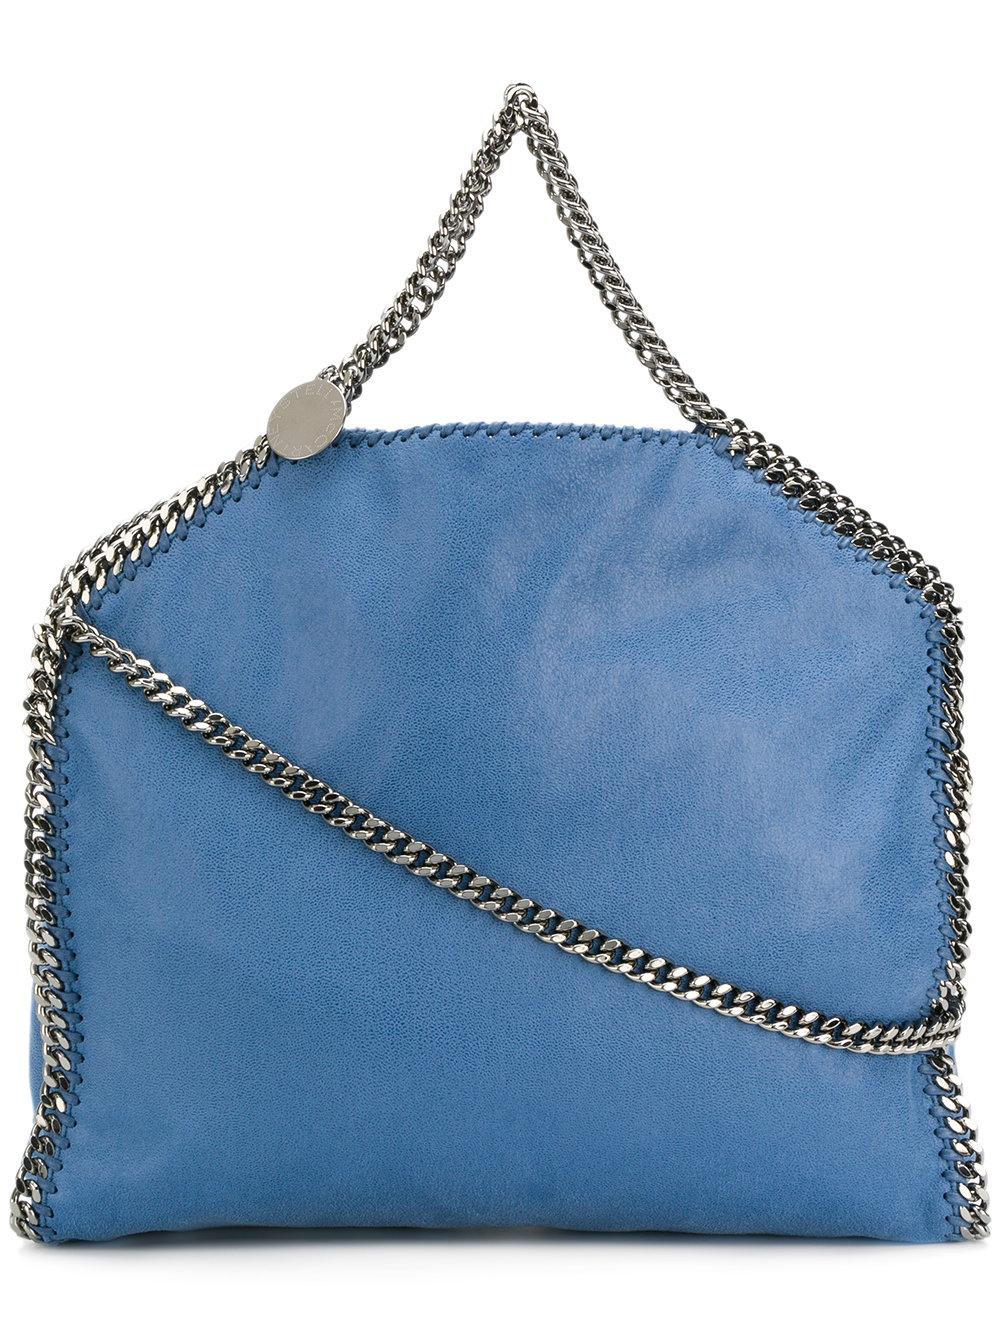 3629455234 Stella Mccartney Falabella Foldover Tote Bag - Blue